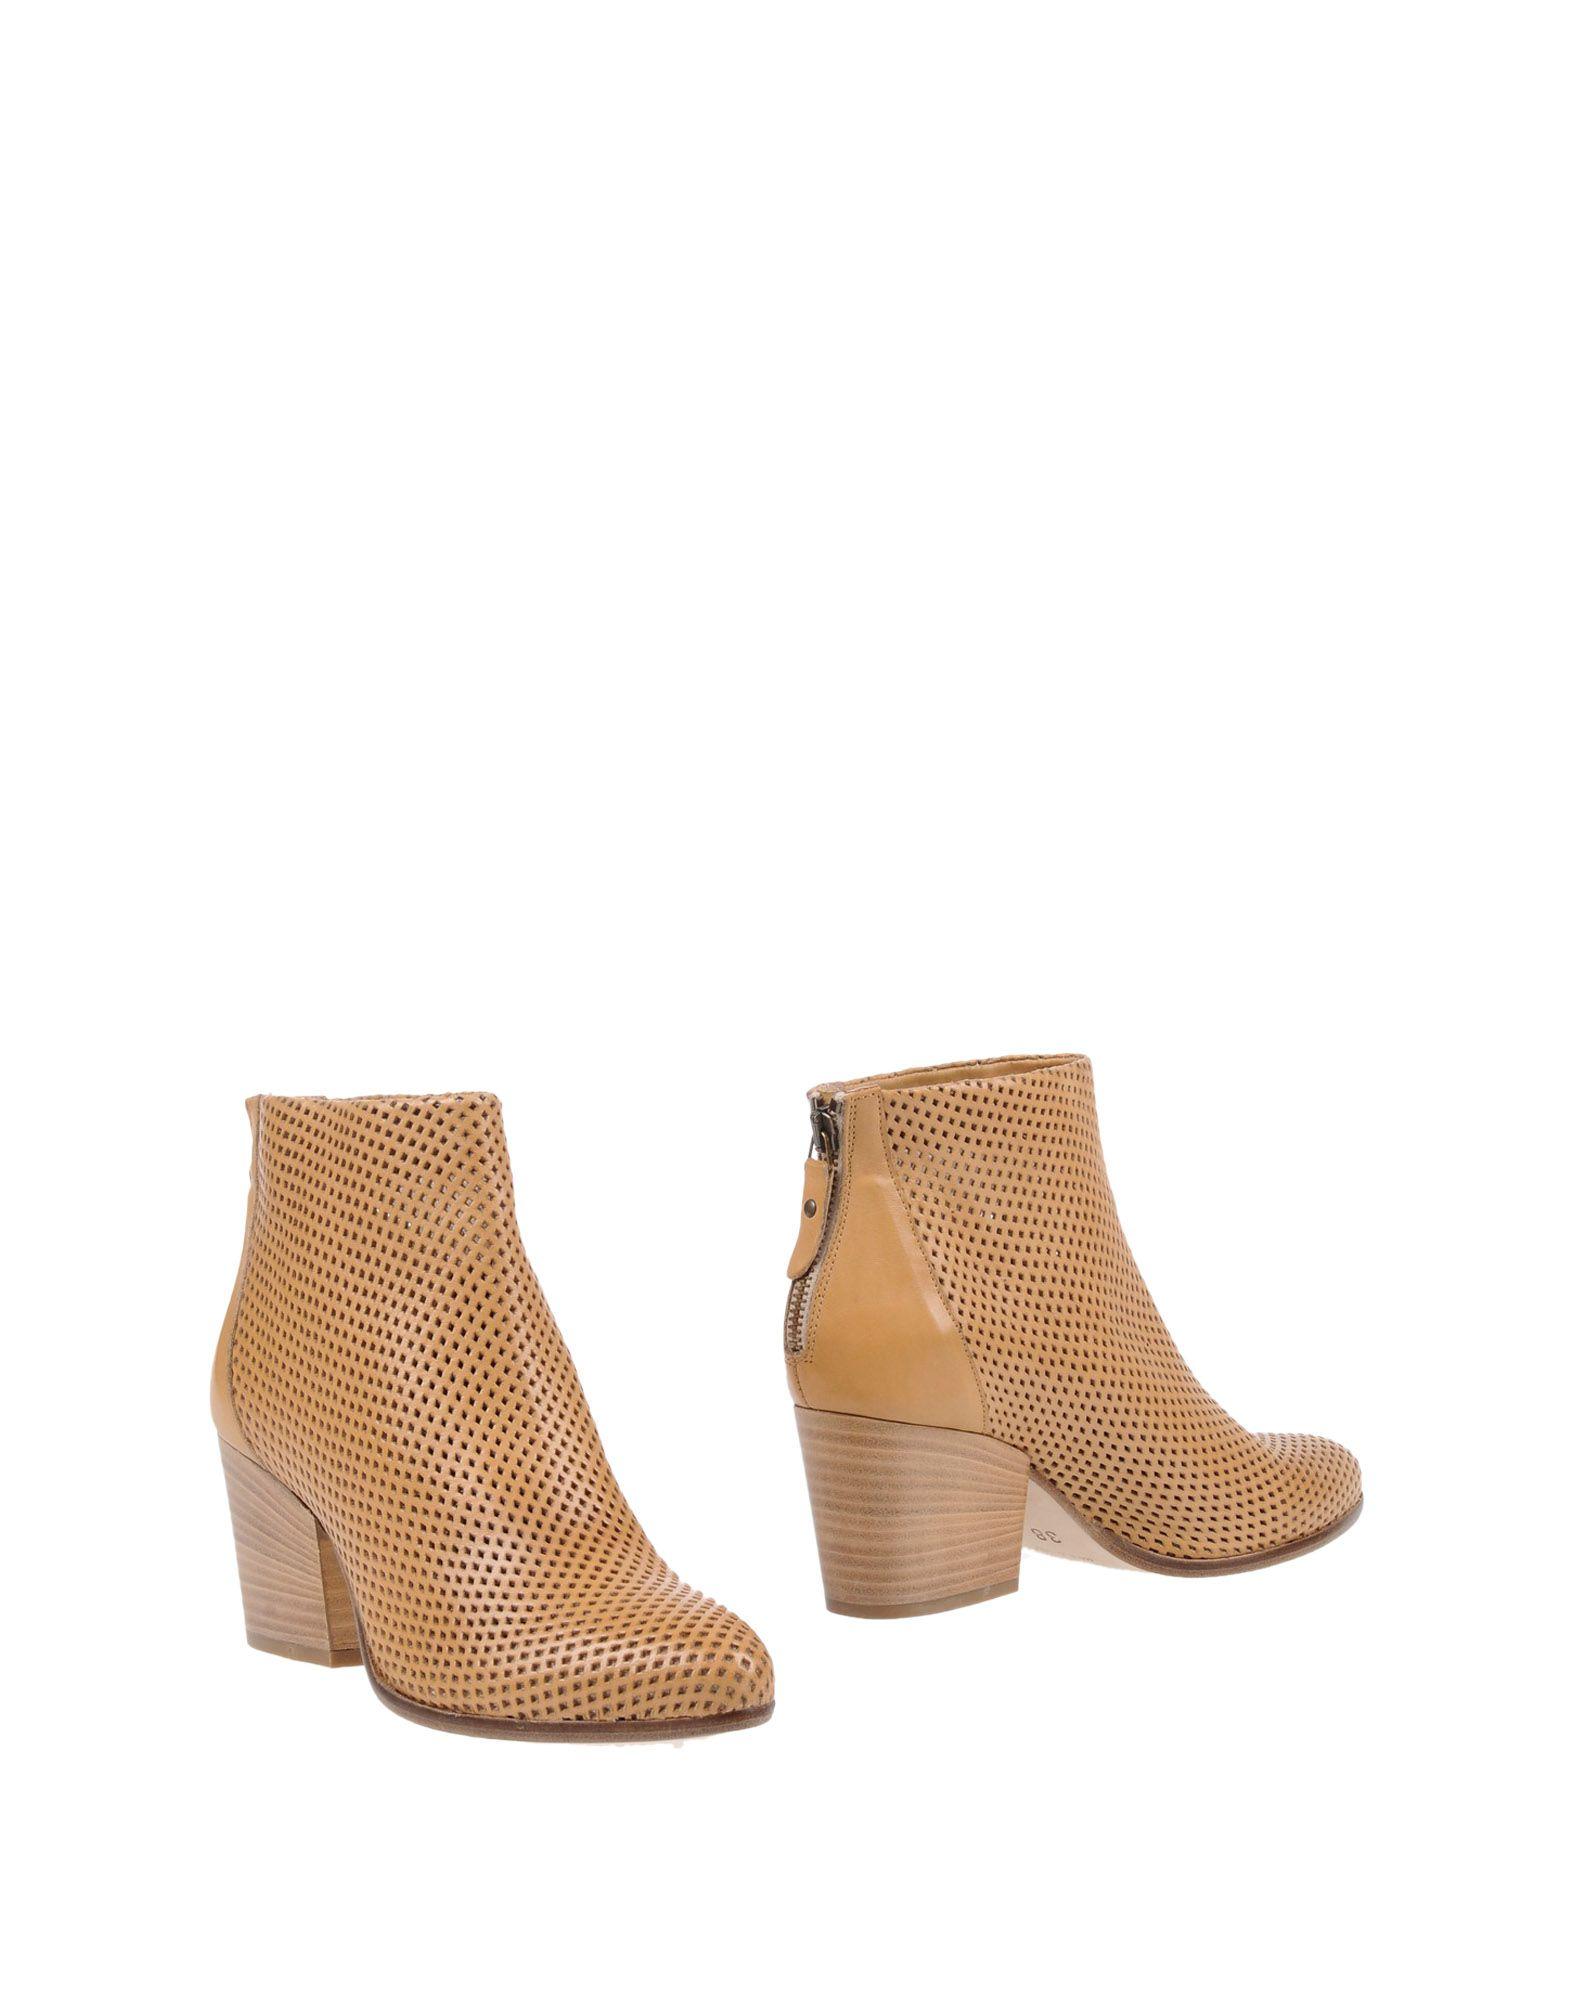 Moda Stivaletti Brawn's Donna - 11460255PH